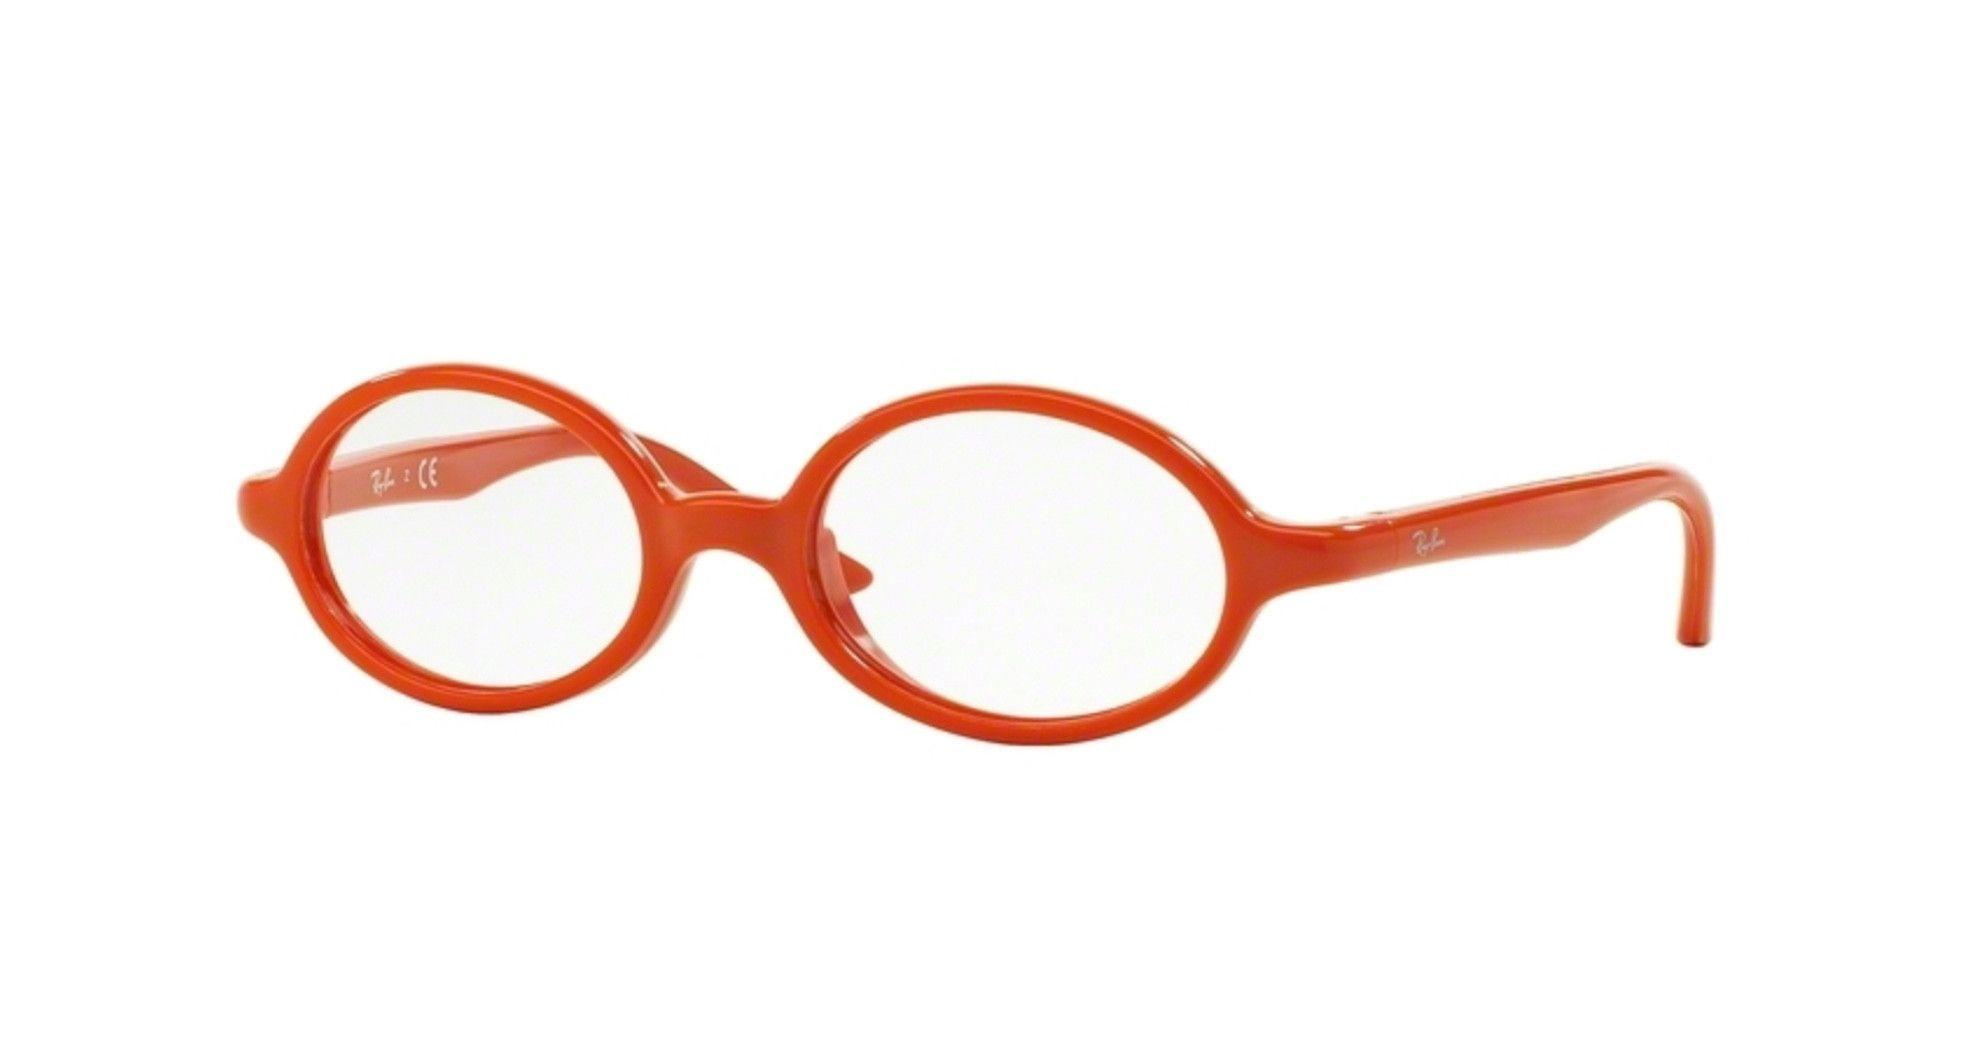 87a5e1212a Ray-Ban Kids RY1545-3640 Orange on Rubber Orange Eyeglasses